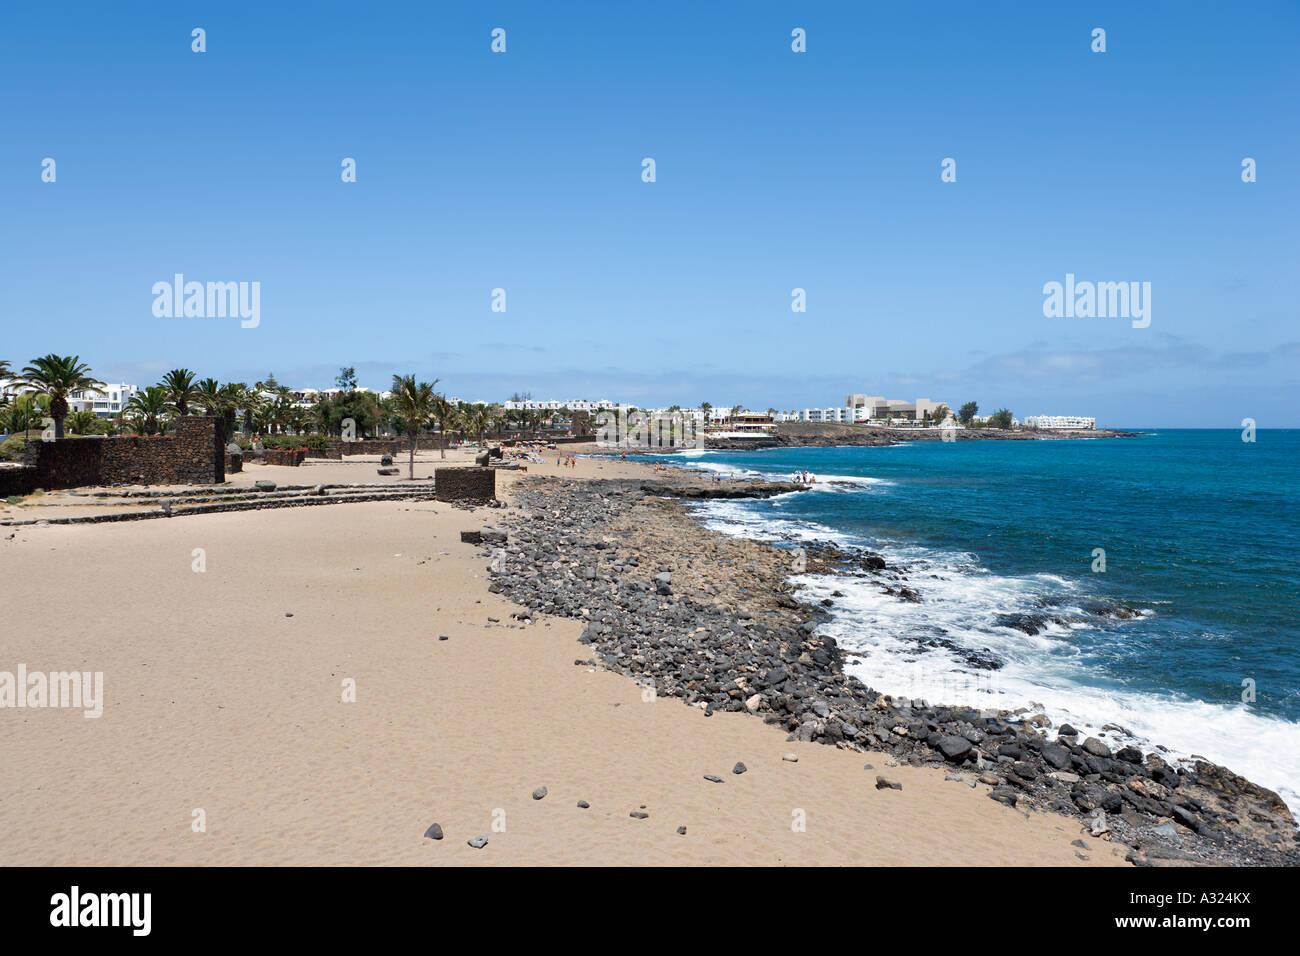 Costa Teguise Lanzarote Canary Islands